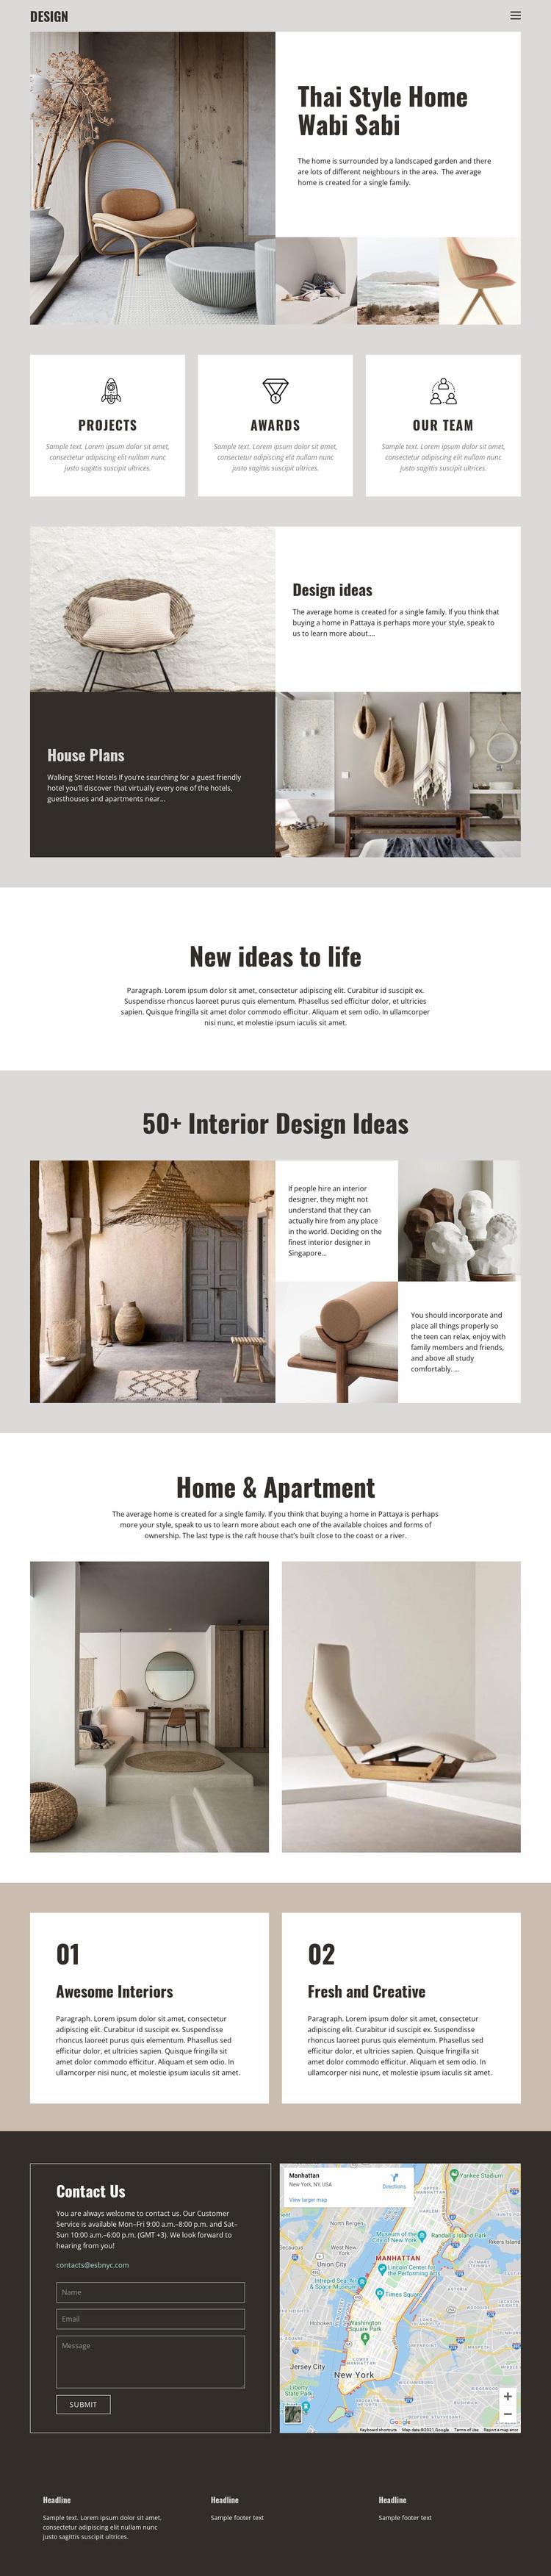 Thai style for home design Website Design